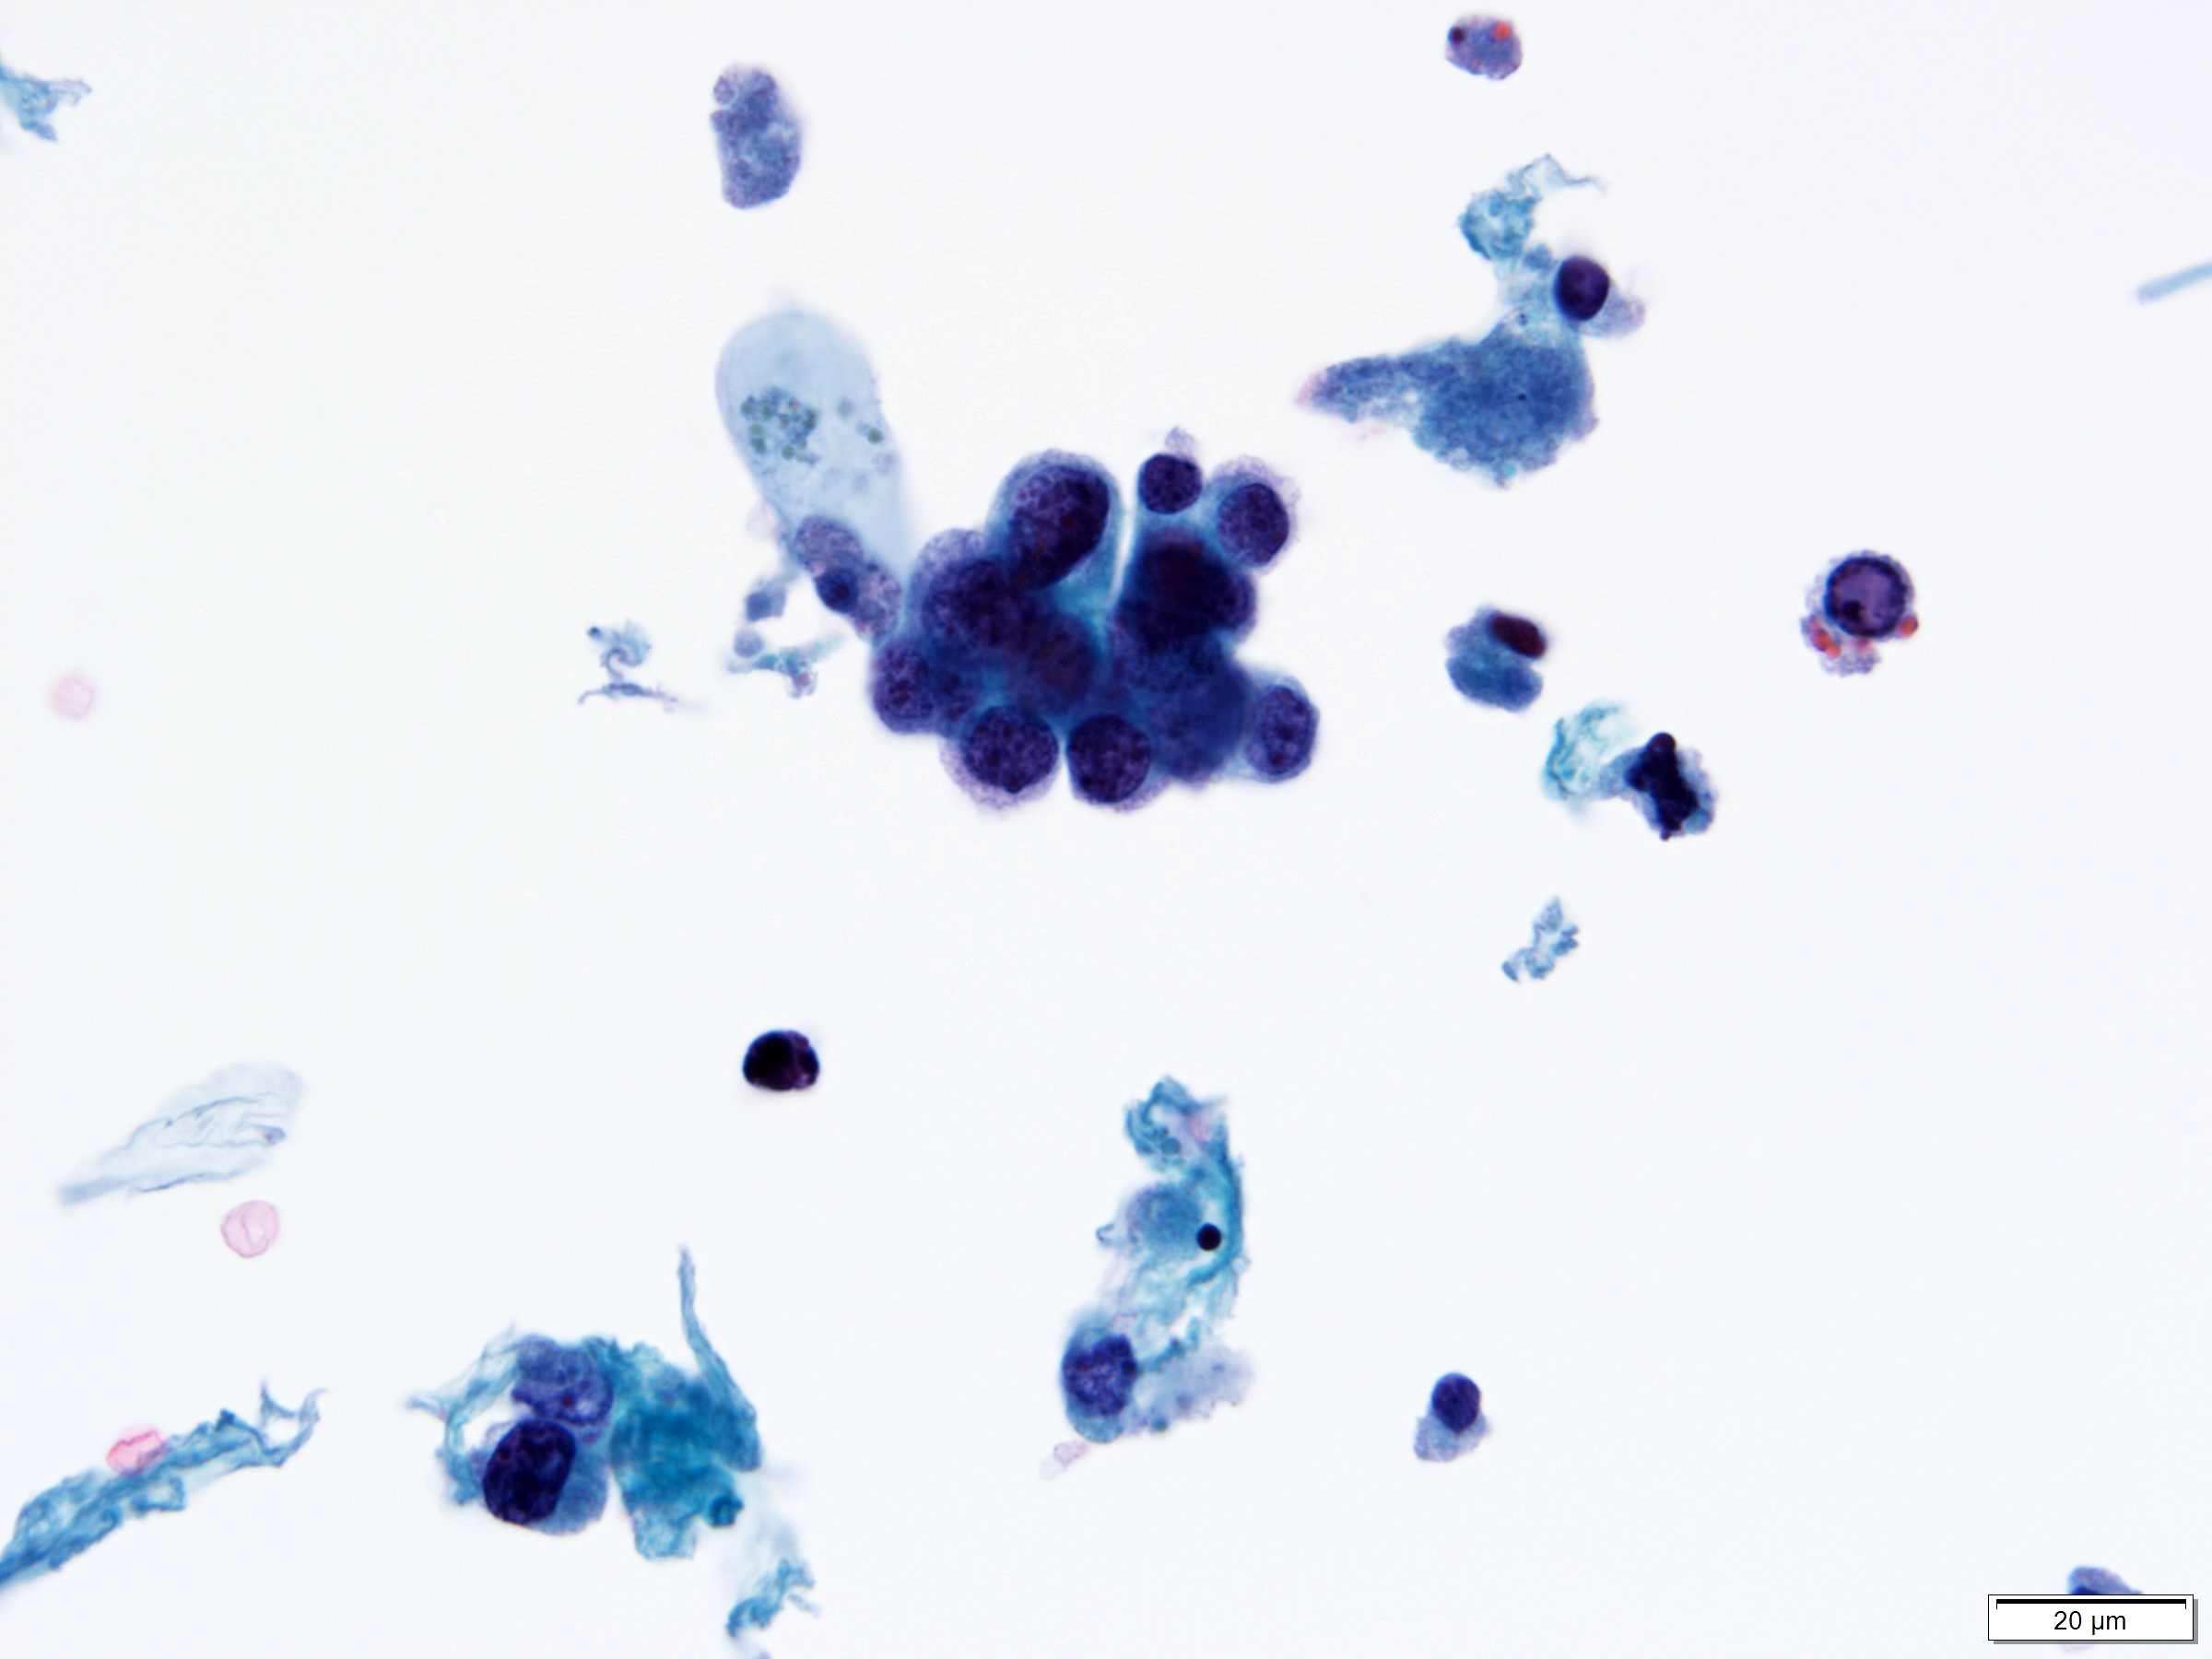 High grade urothelial carcinoma